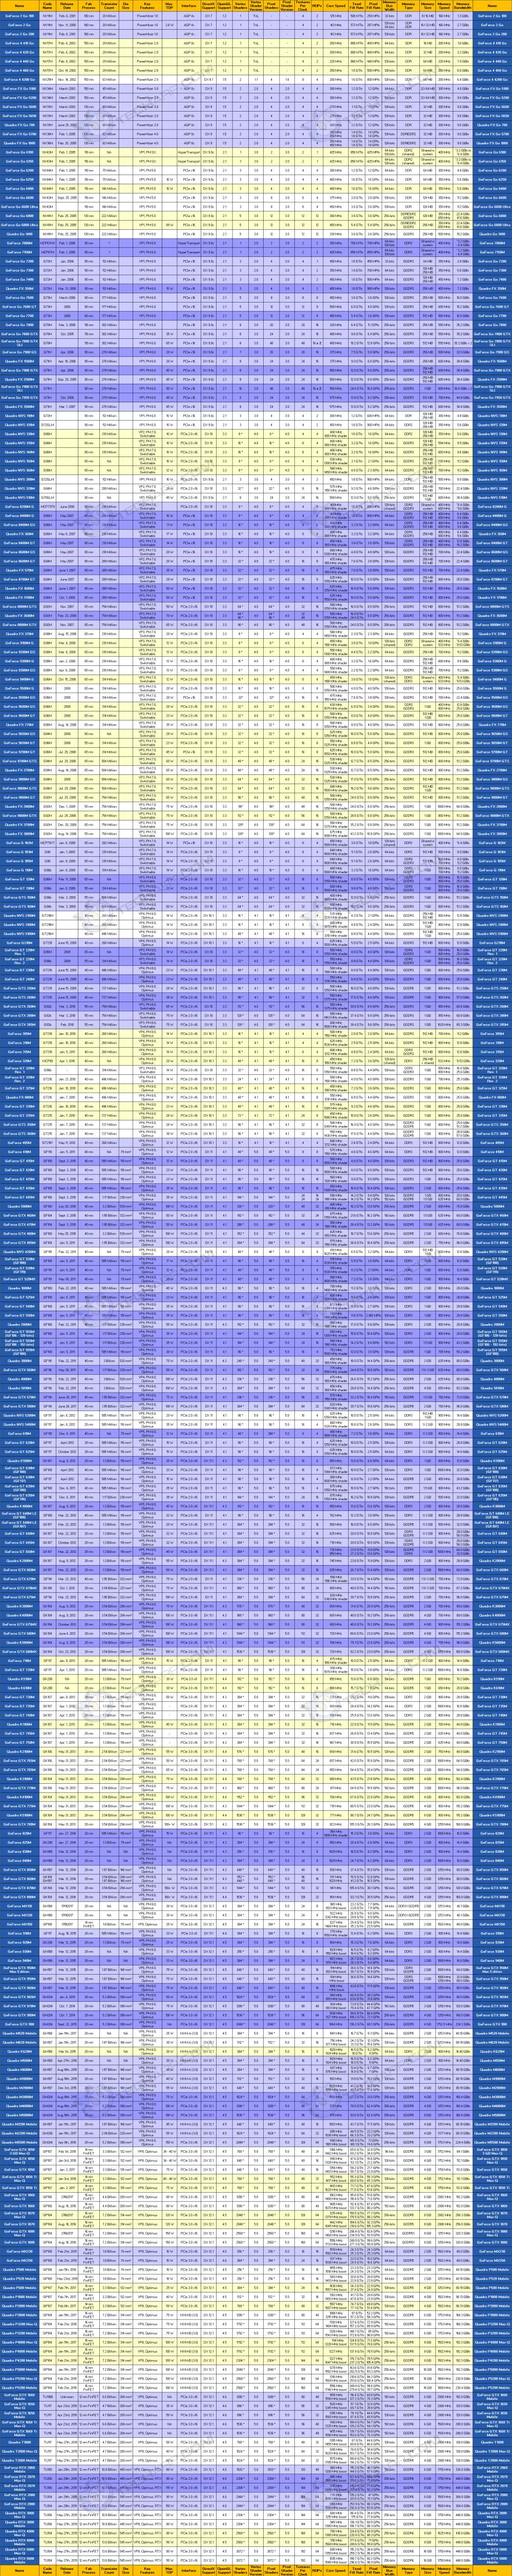 Mobile GPU Comparison Guide - NVIDIA